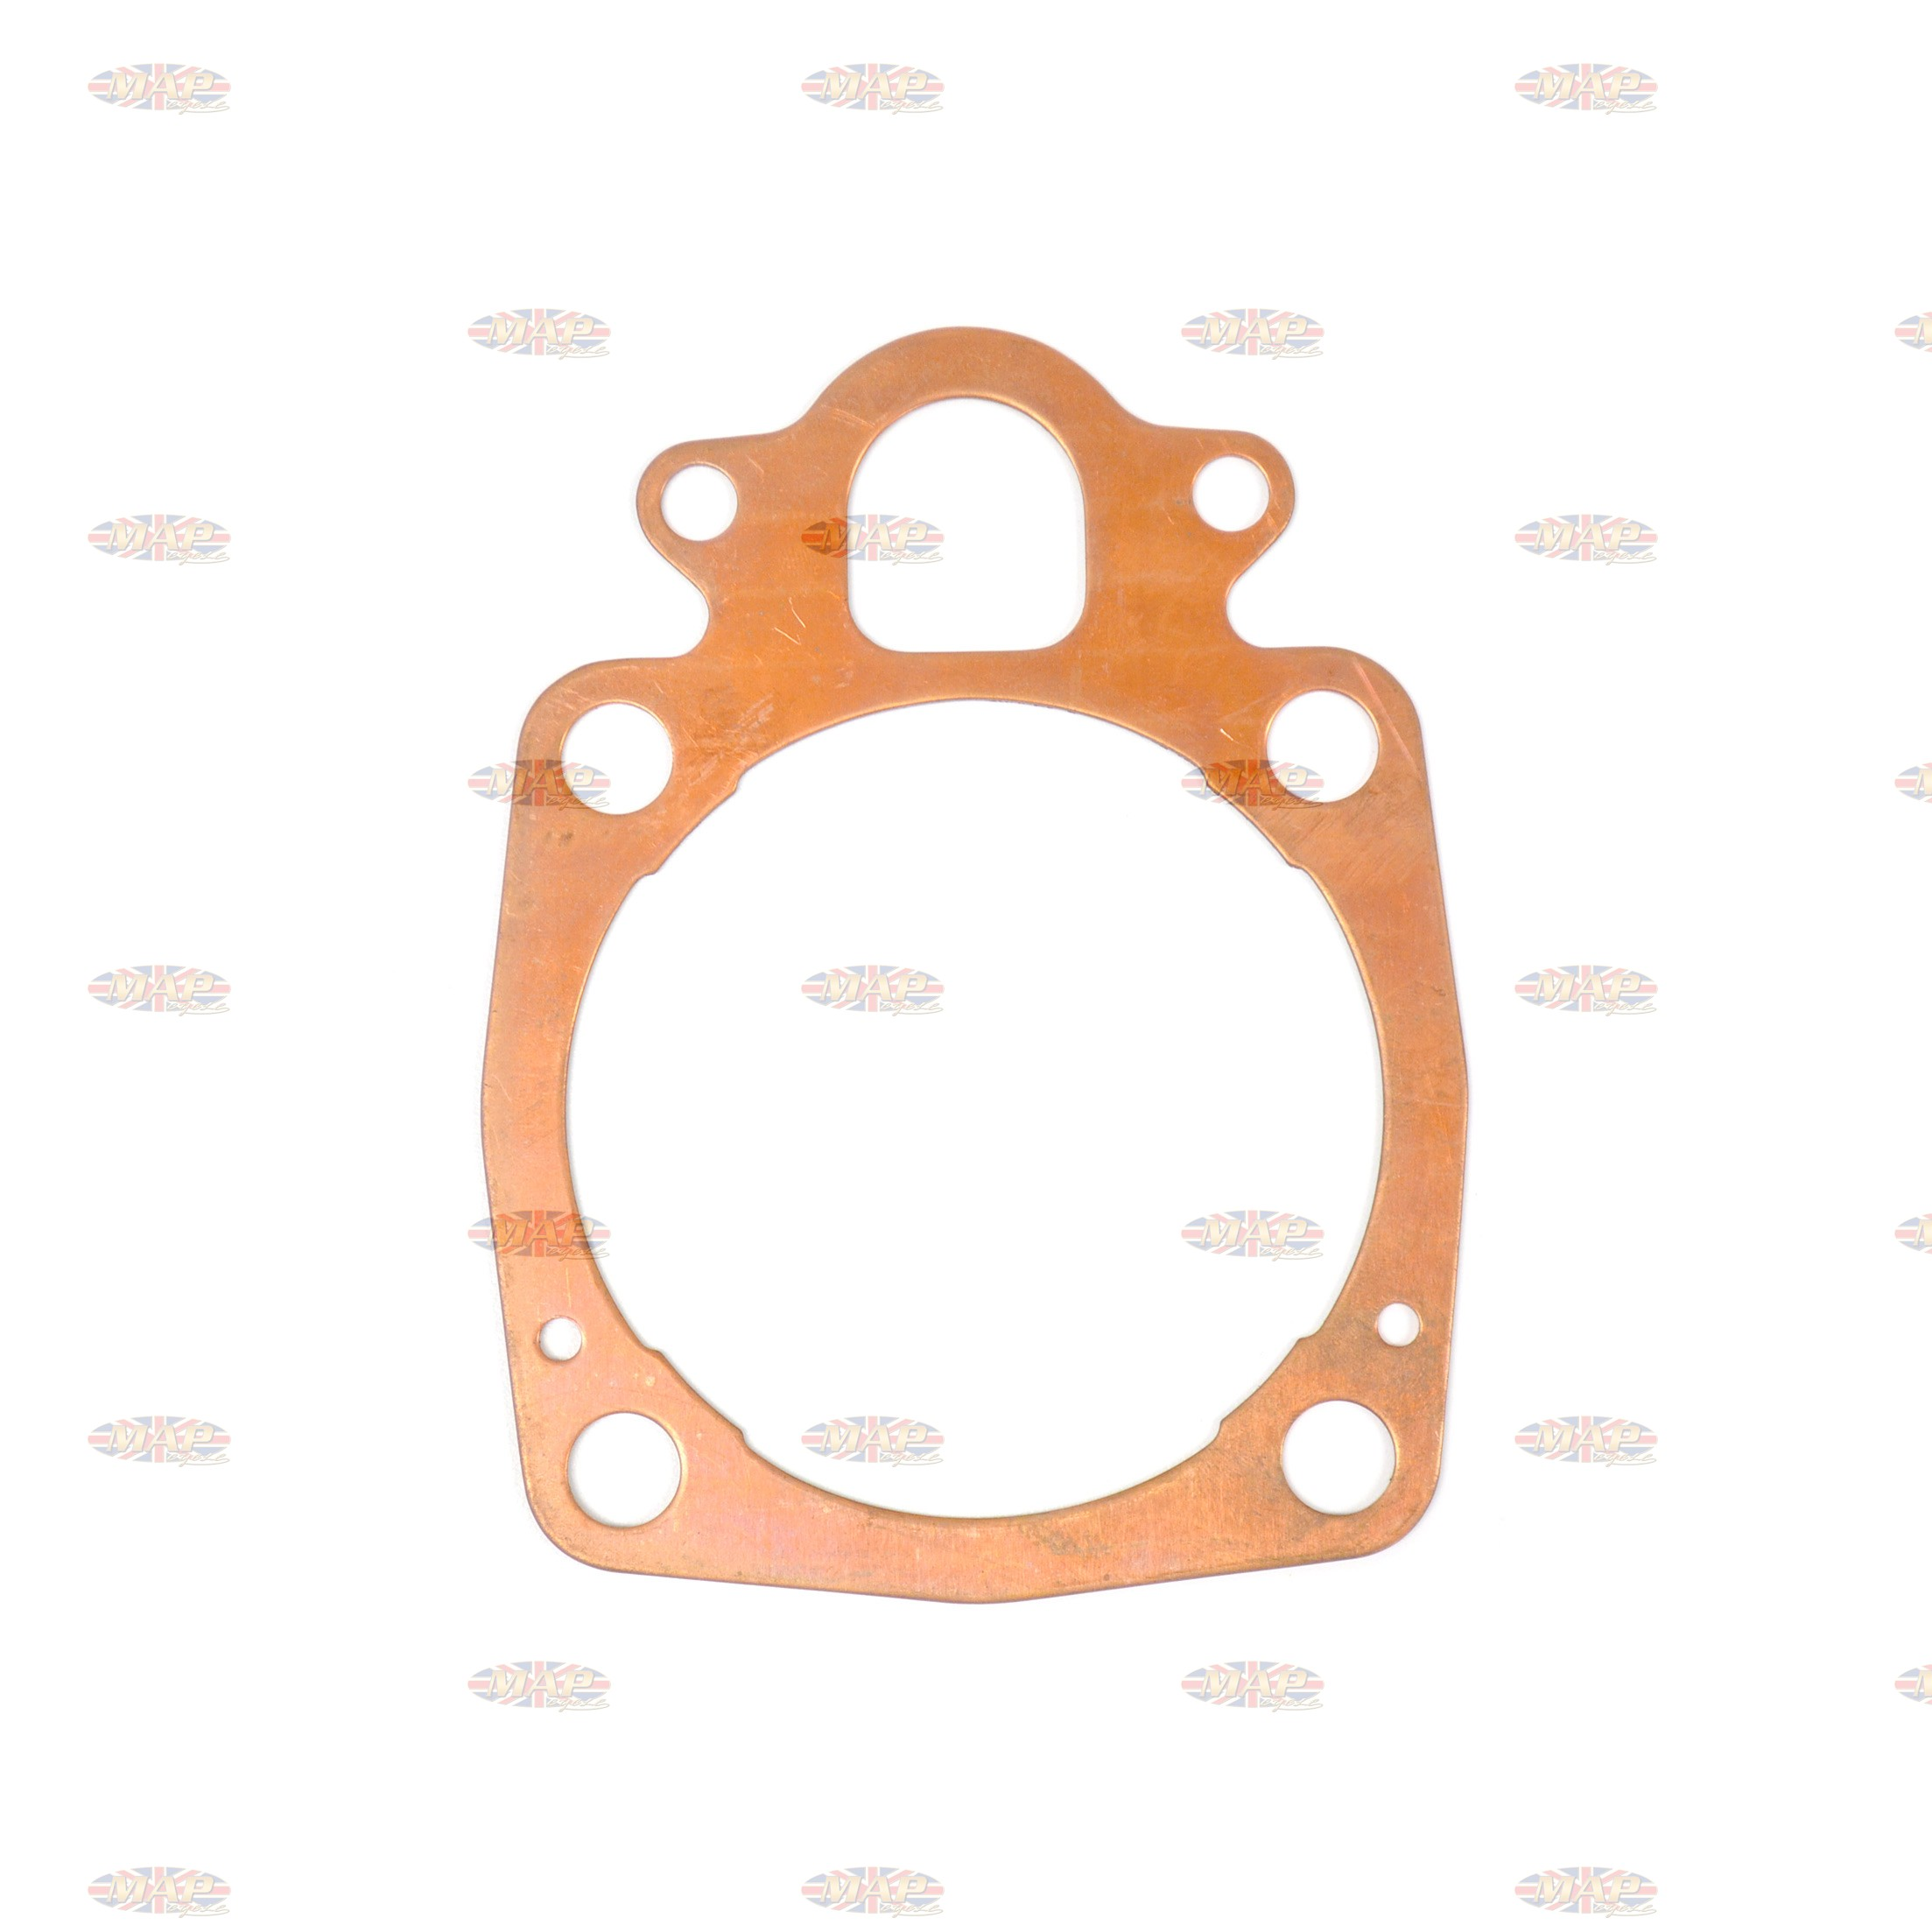 BSA 500cc Single, Deadsoft Copper Headgasket 71-1625